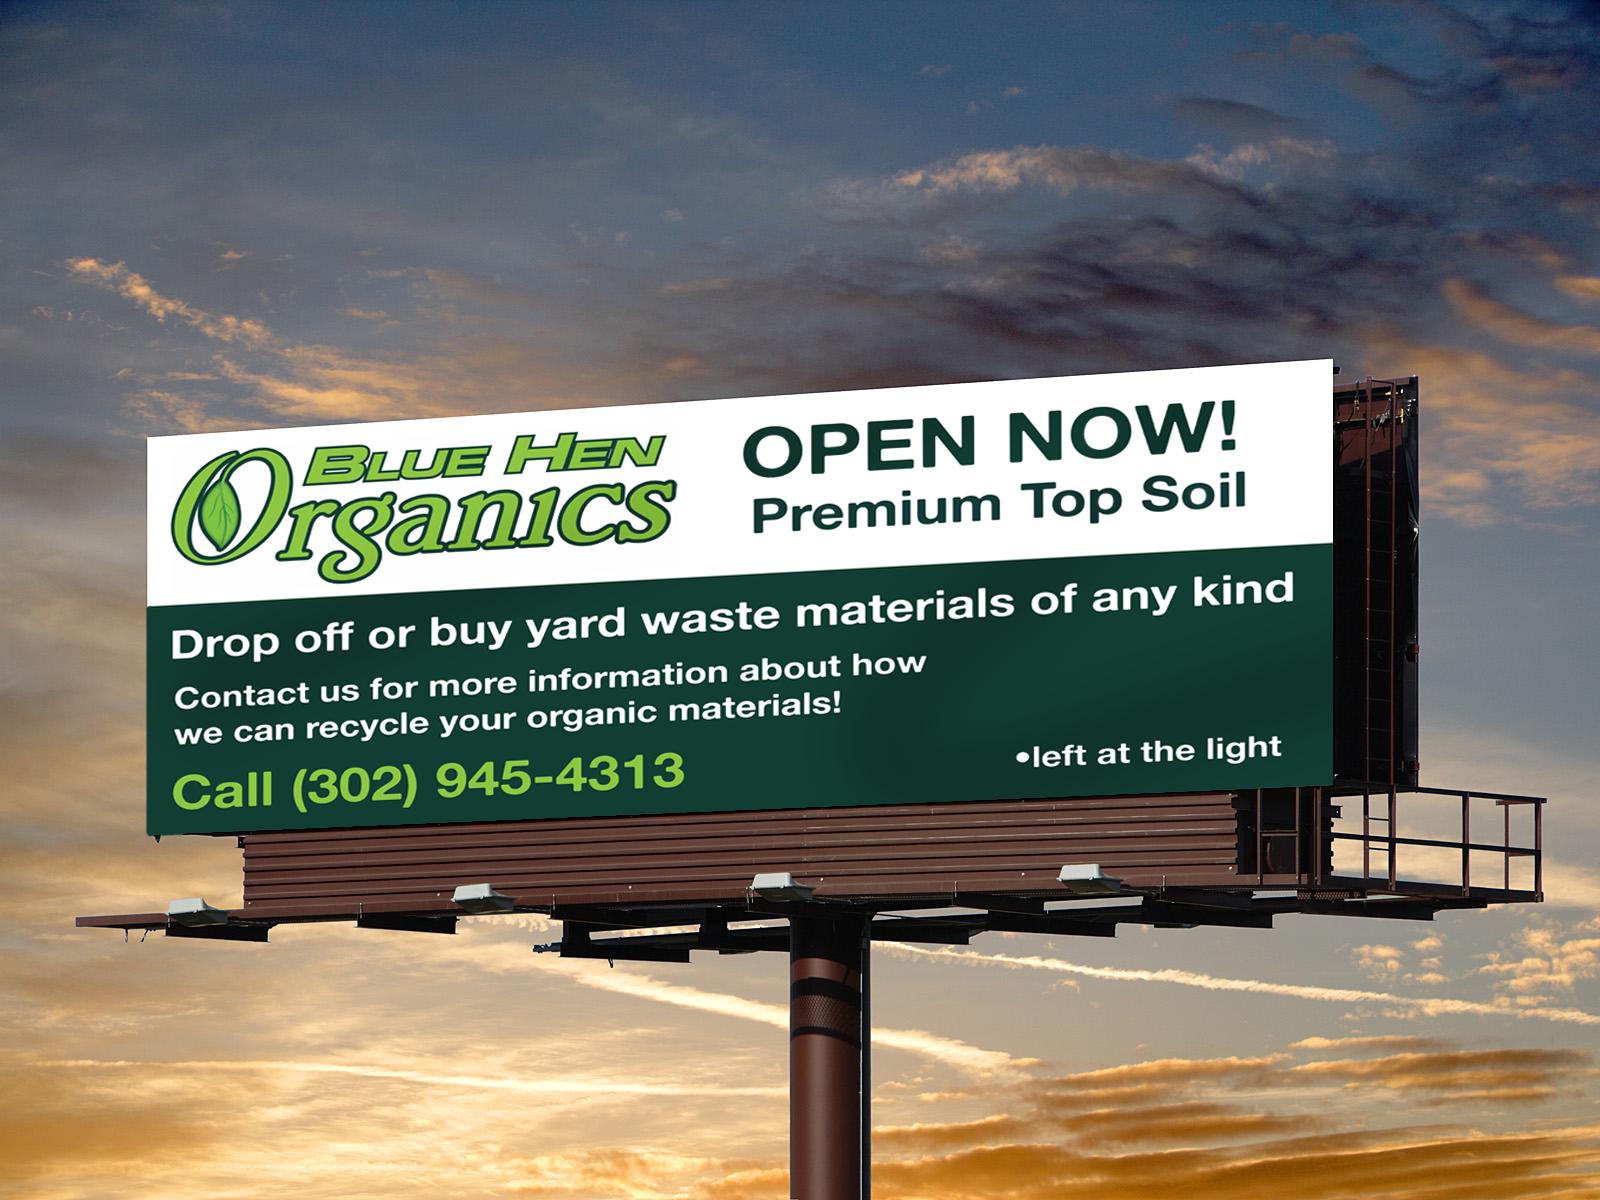 Blue Hen Organics Recycling Program -